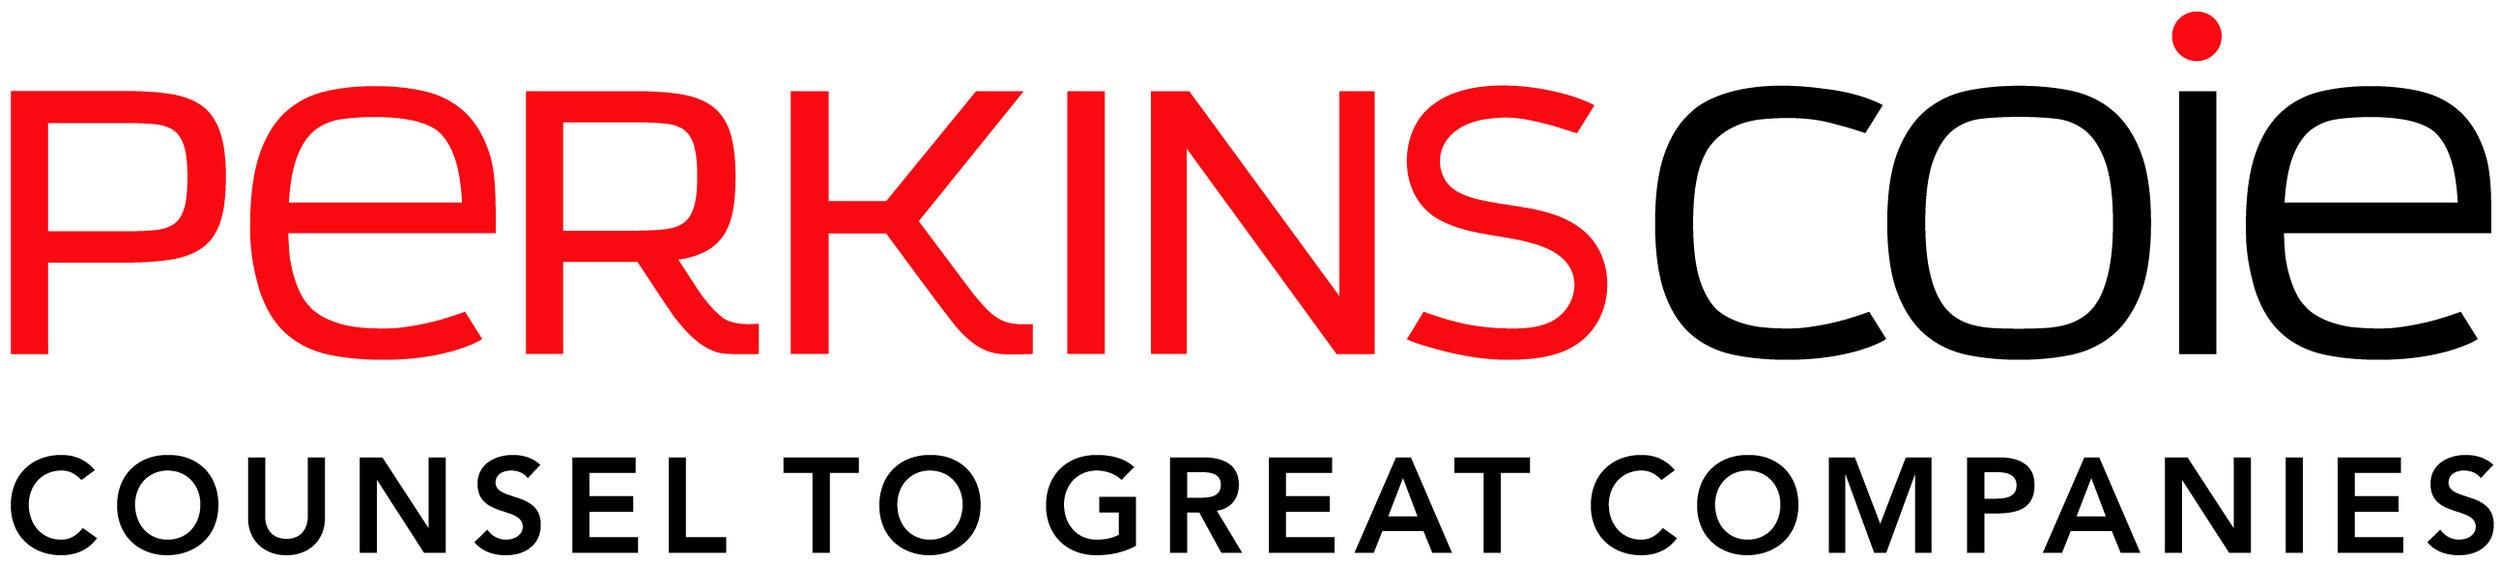 Perkins Coie Logo copy.jpg